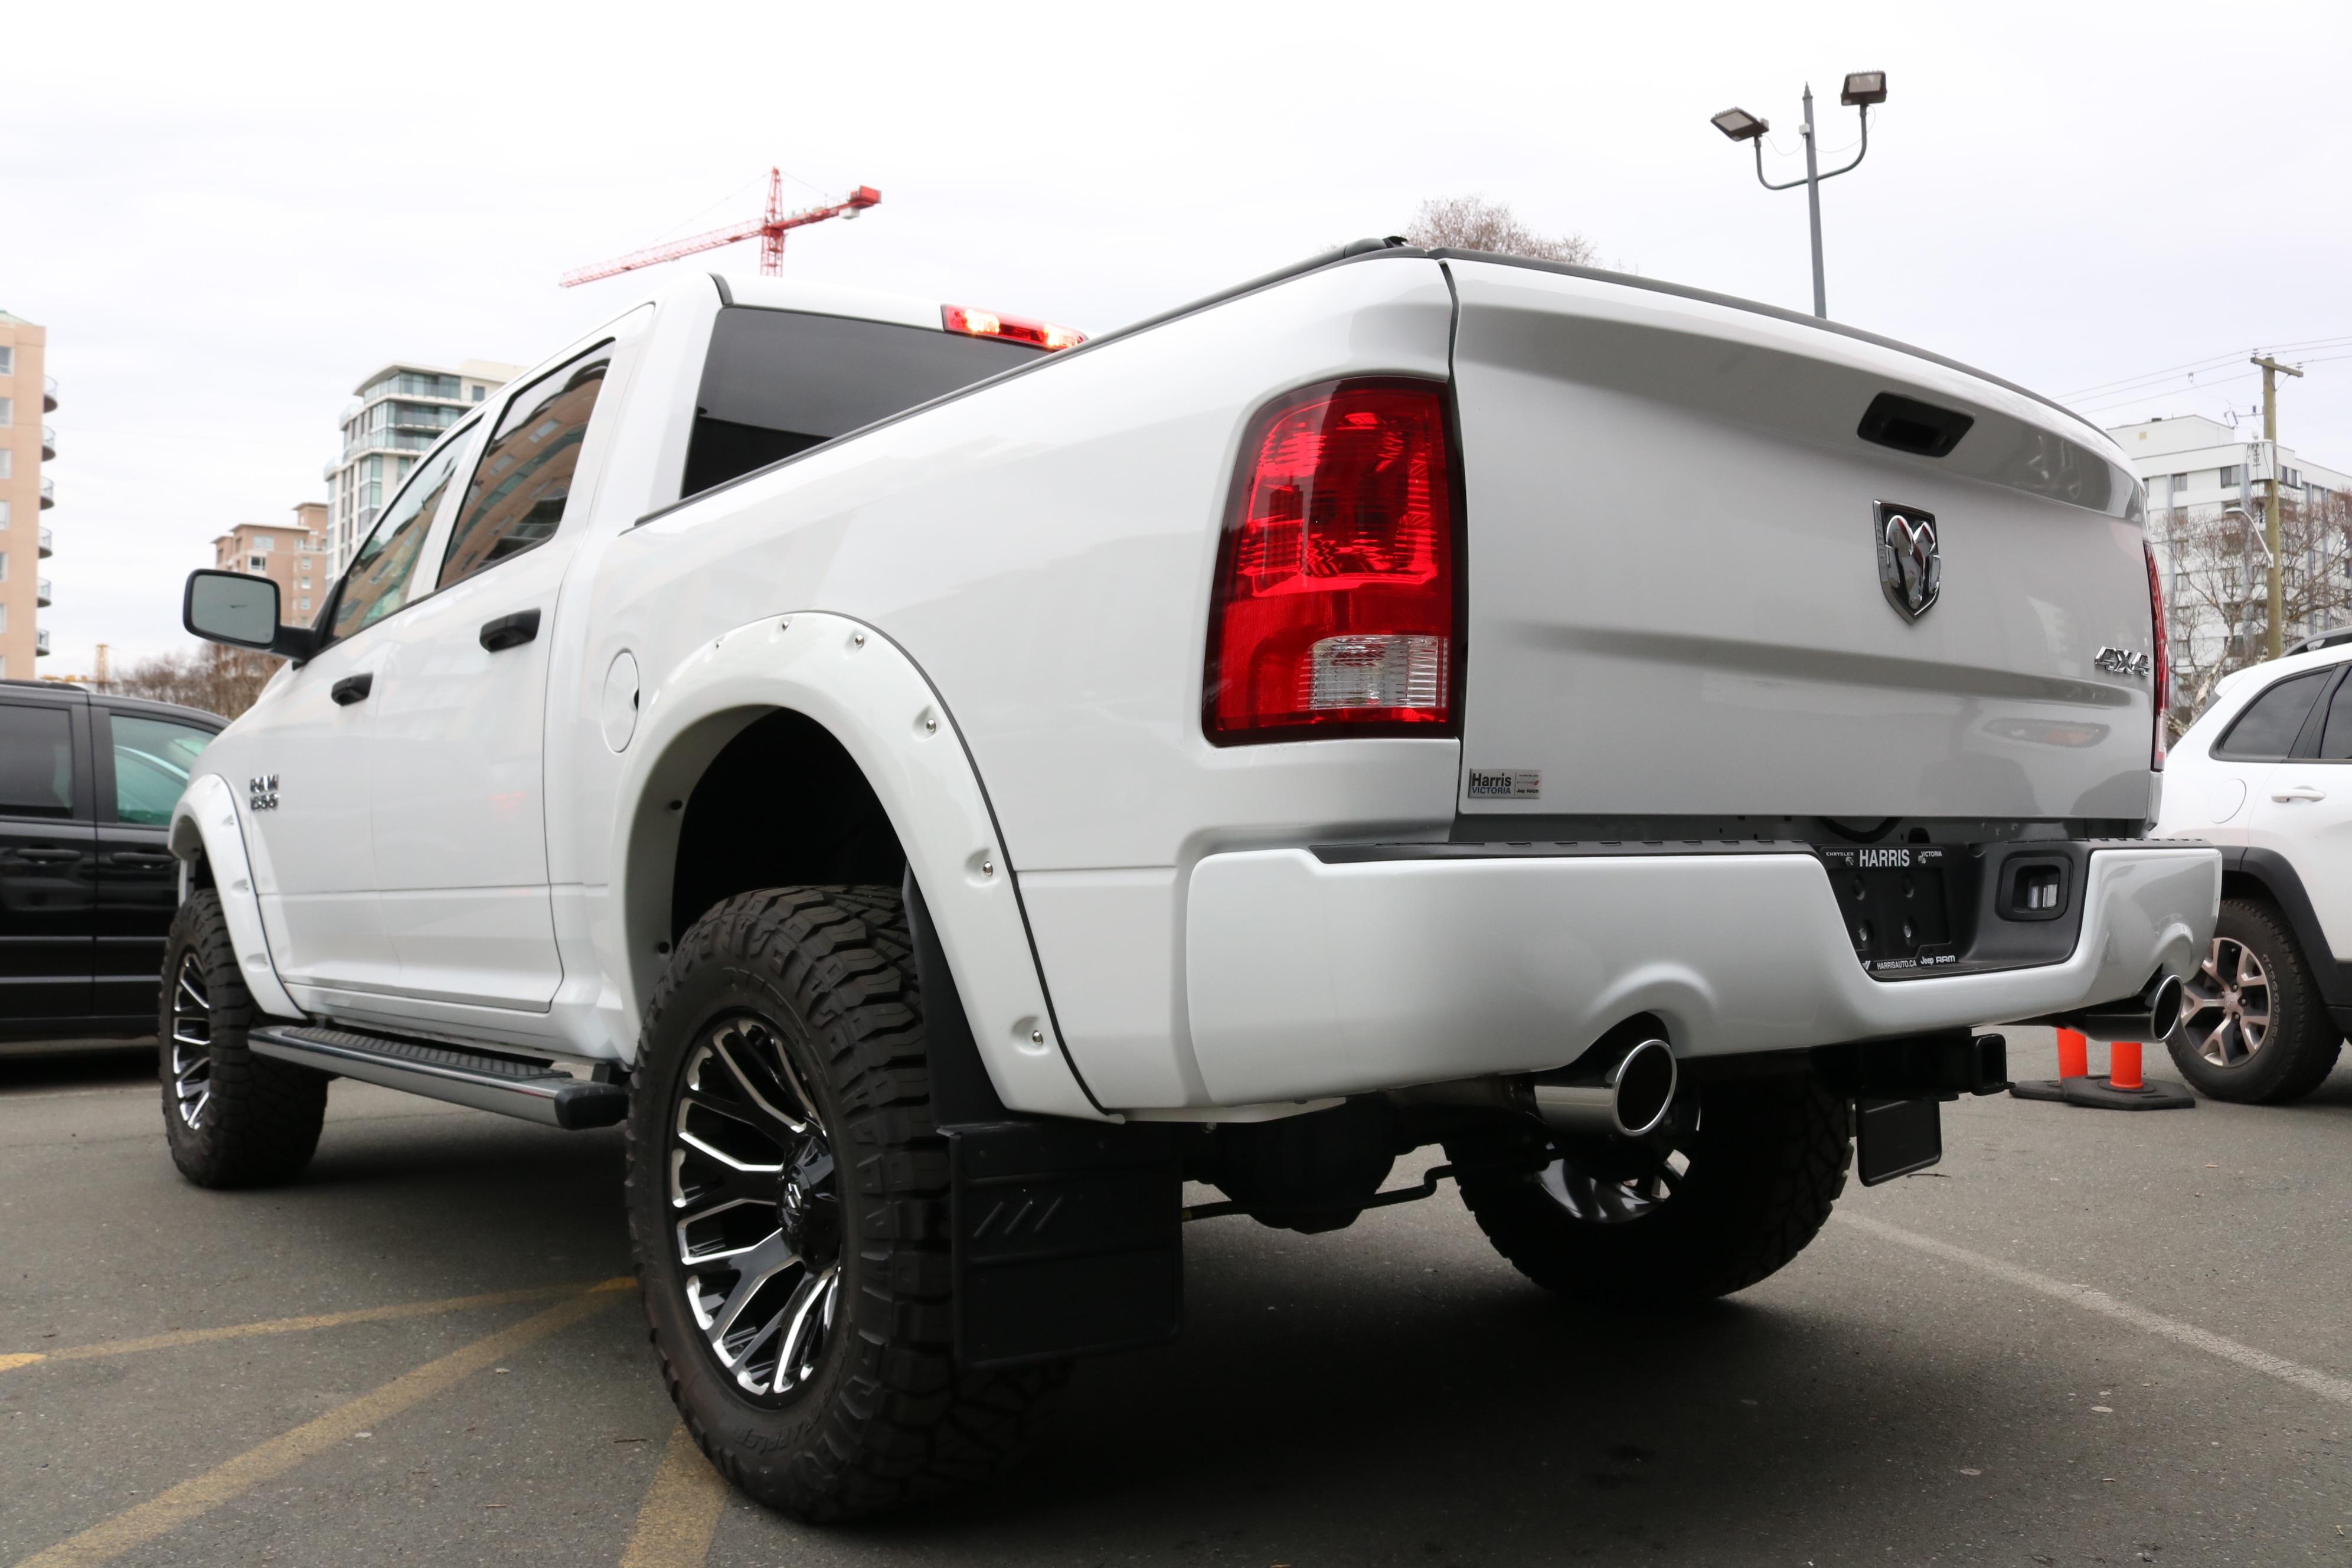 New 2018 Dodge RAM Express Custom Upgrades For Sale